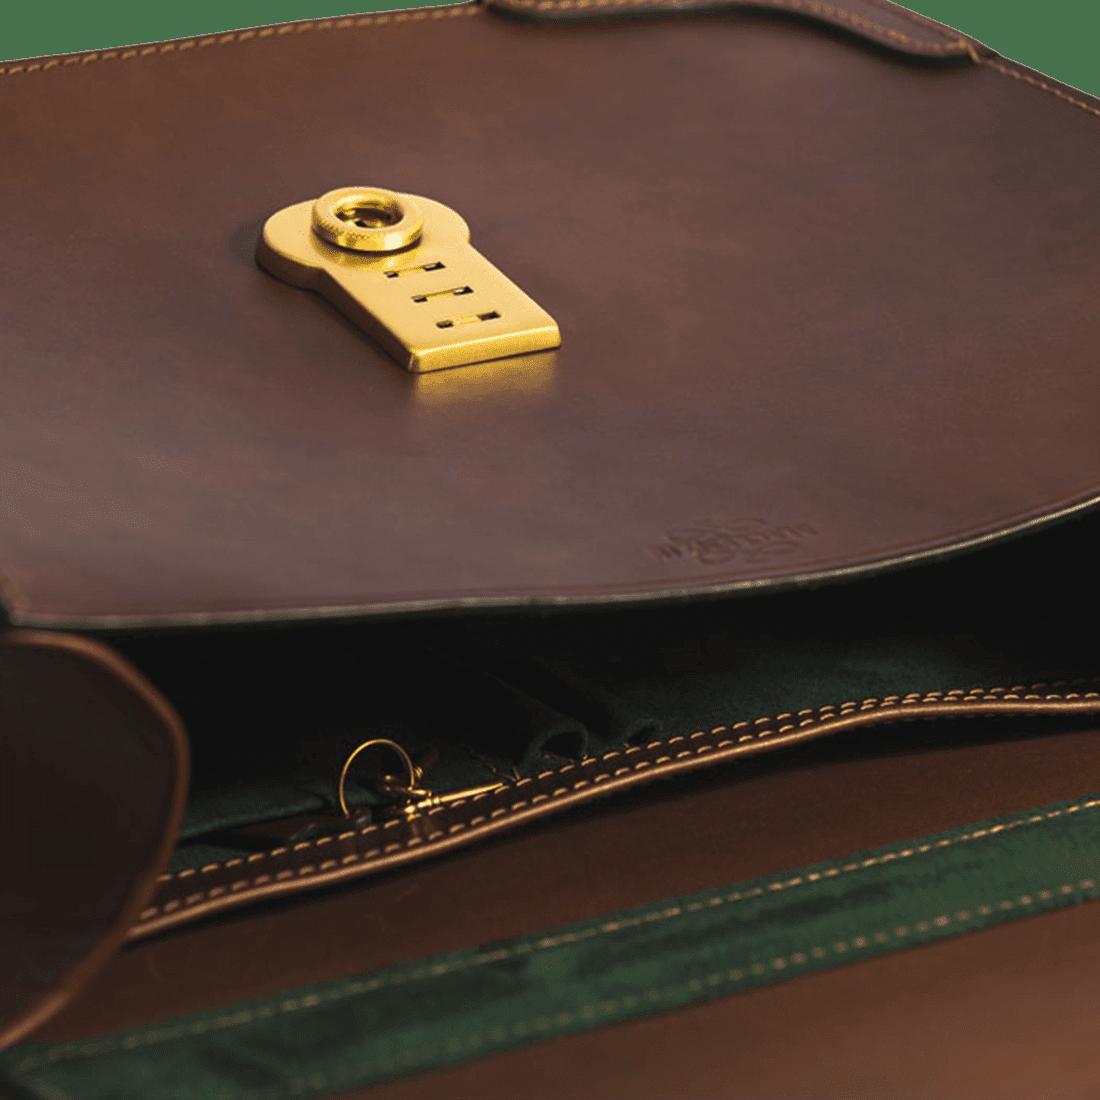 The Basic briefcase chestnut